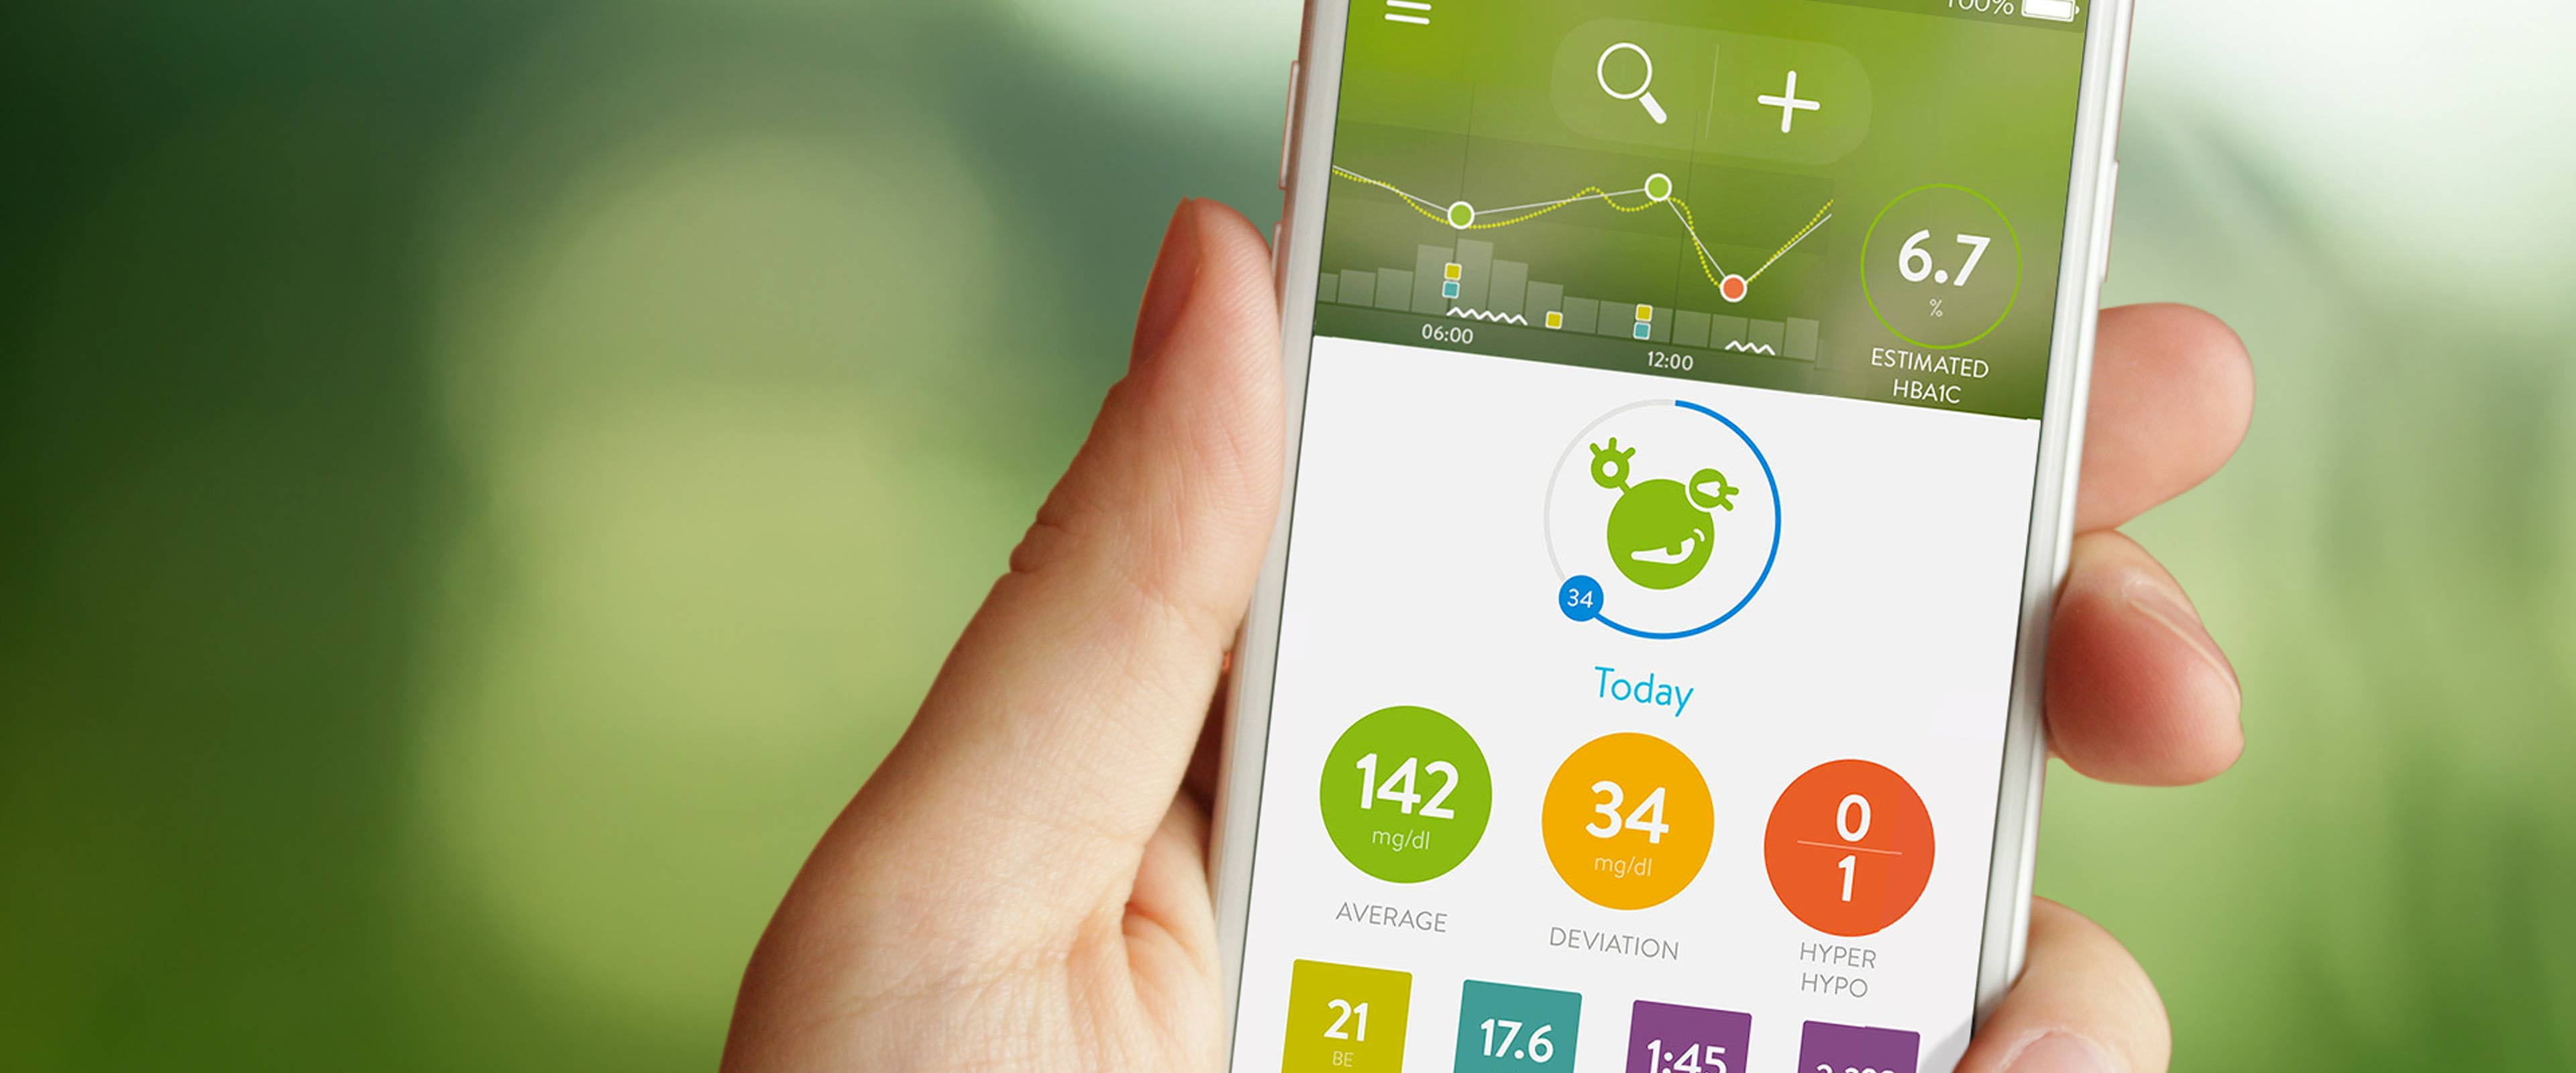 mysugr-diabetis-app-whatshealth